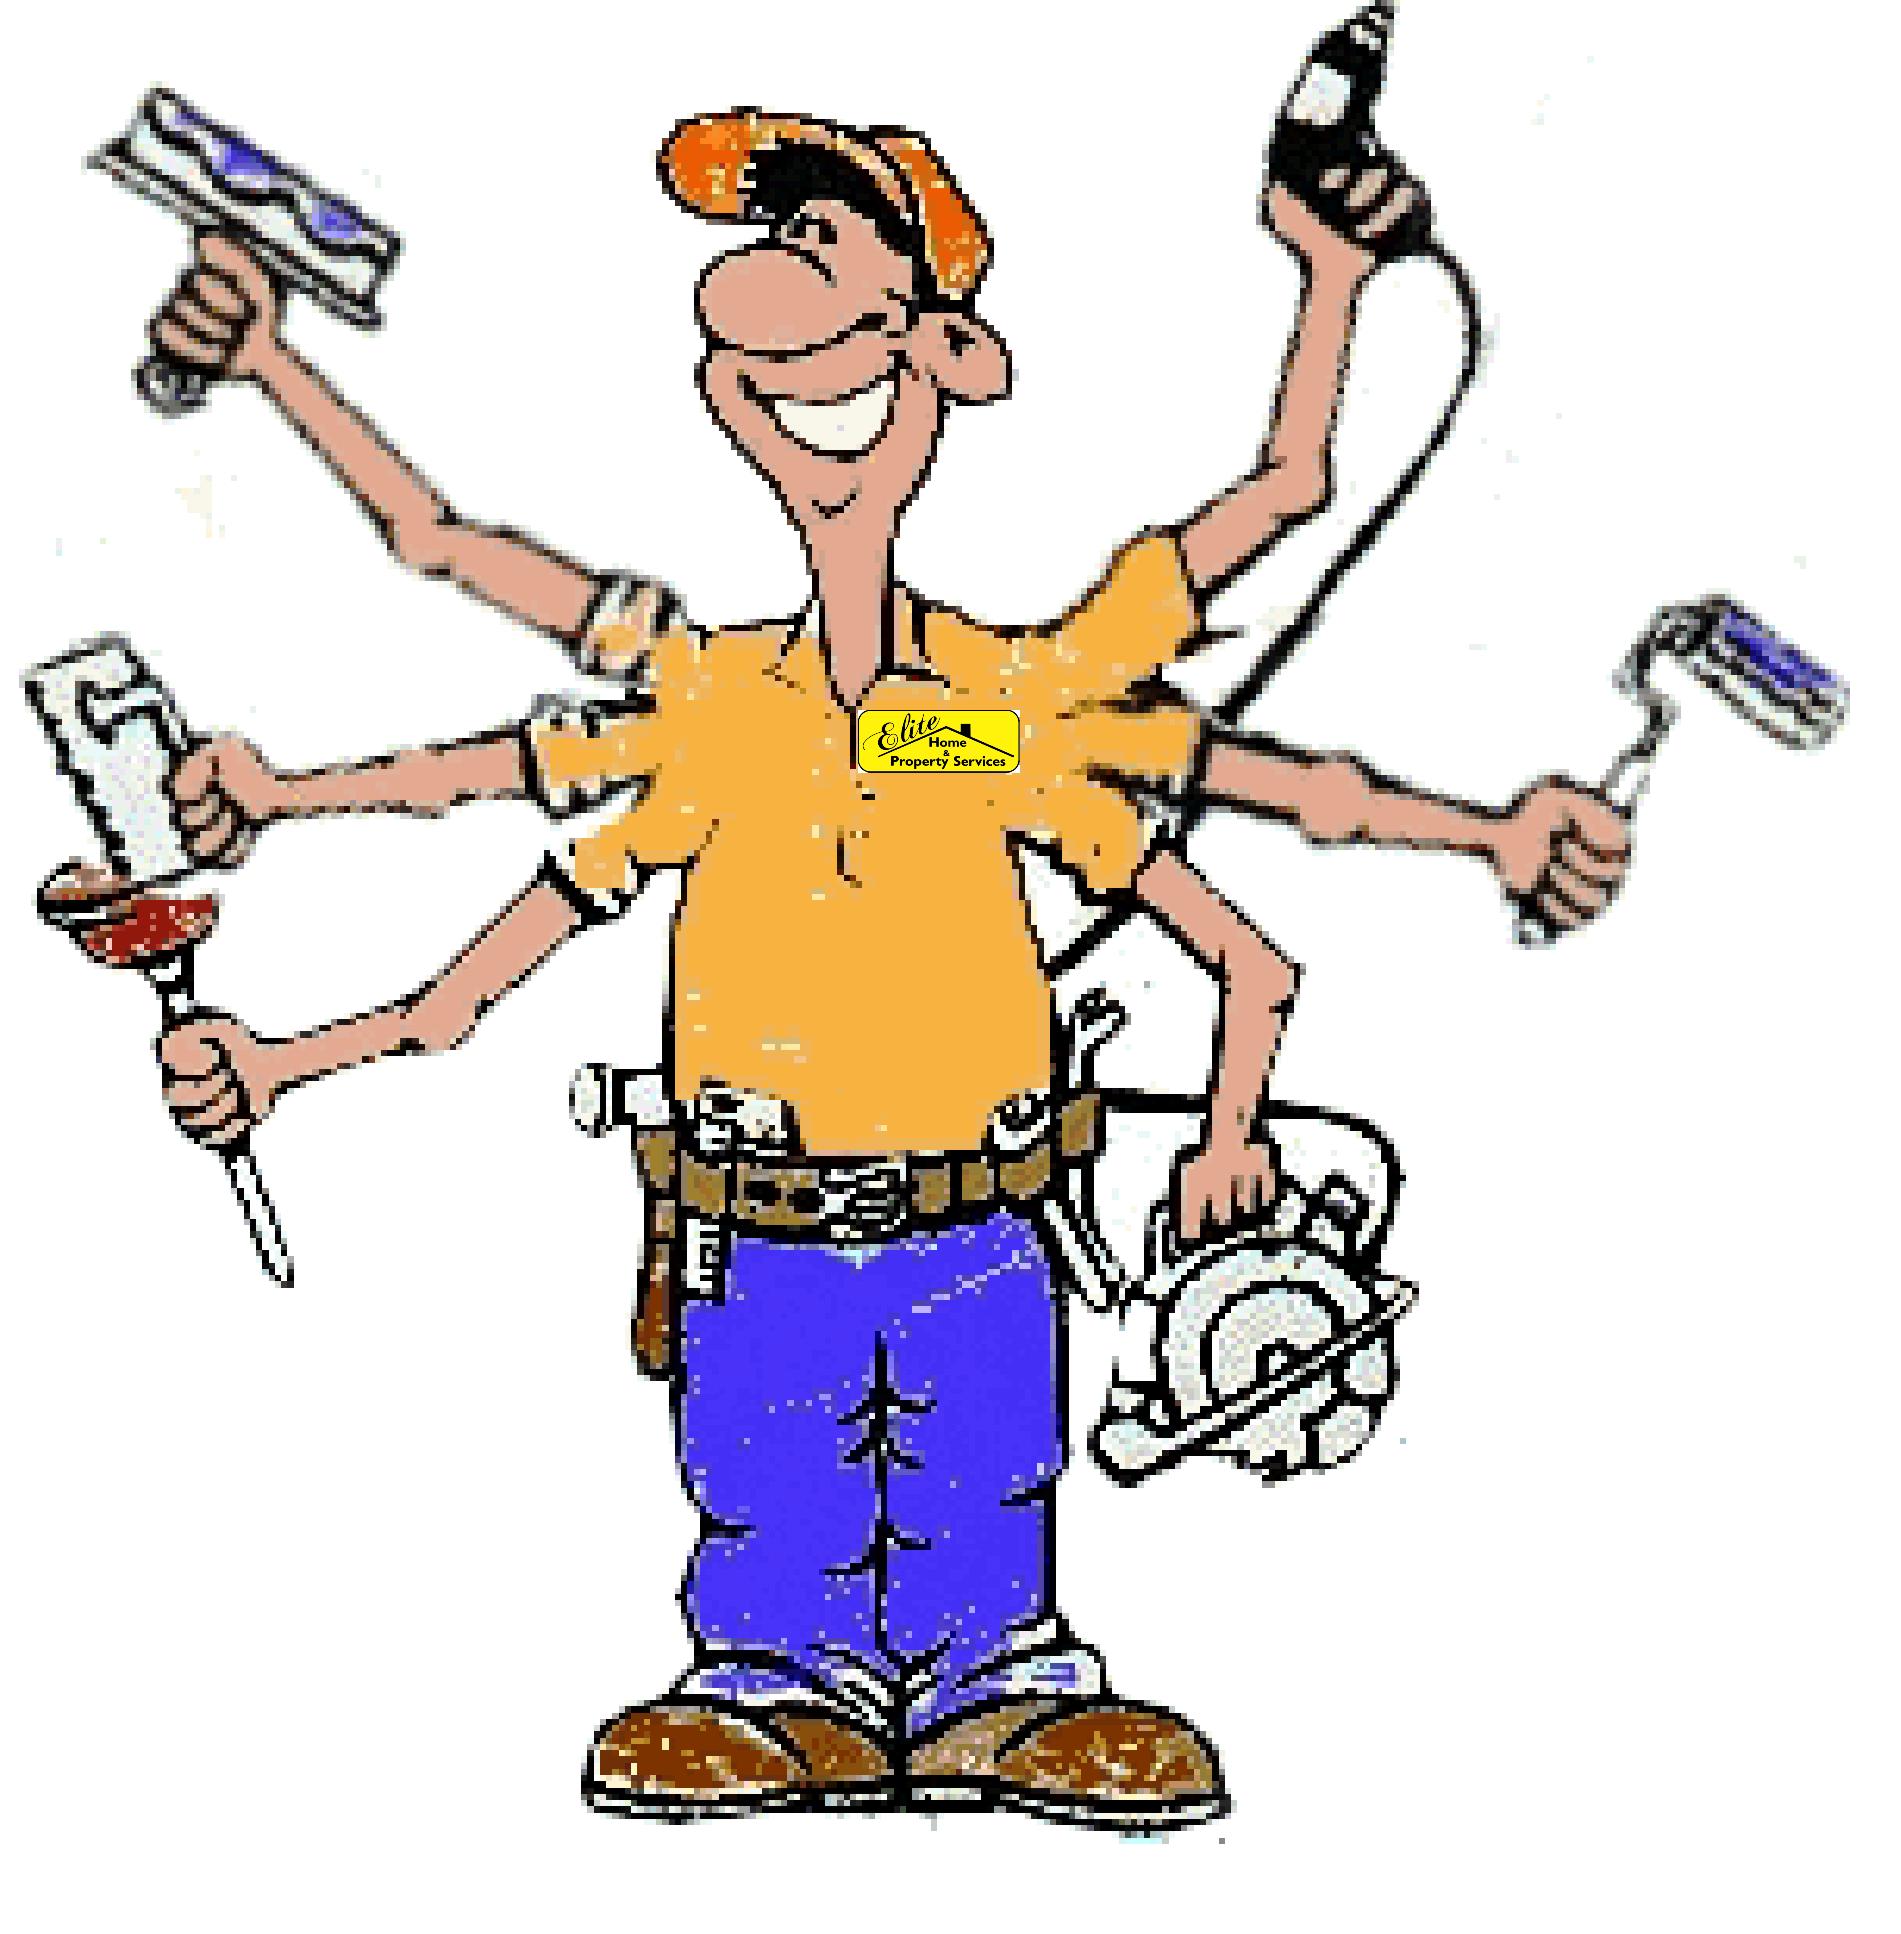 Free Maintenance Tools Cliparts, Download Free Clip Art